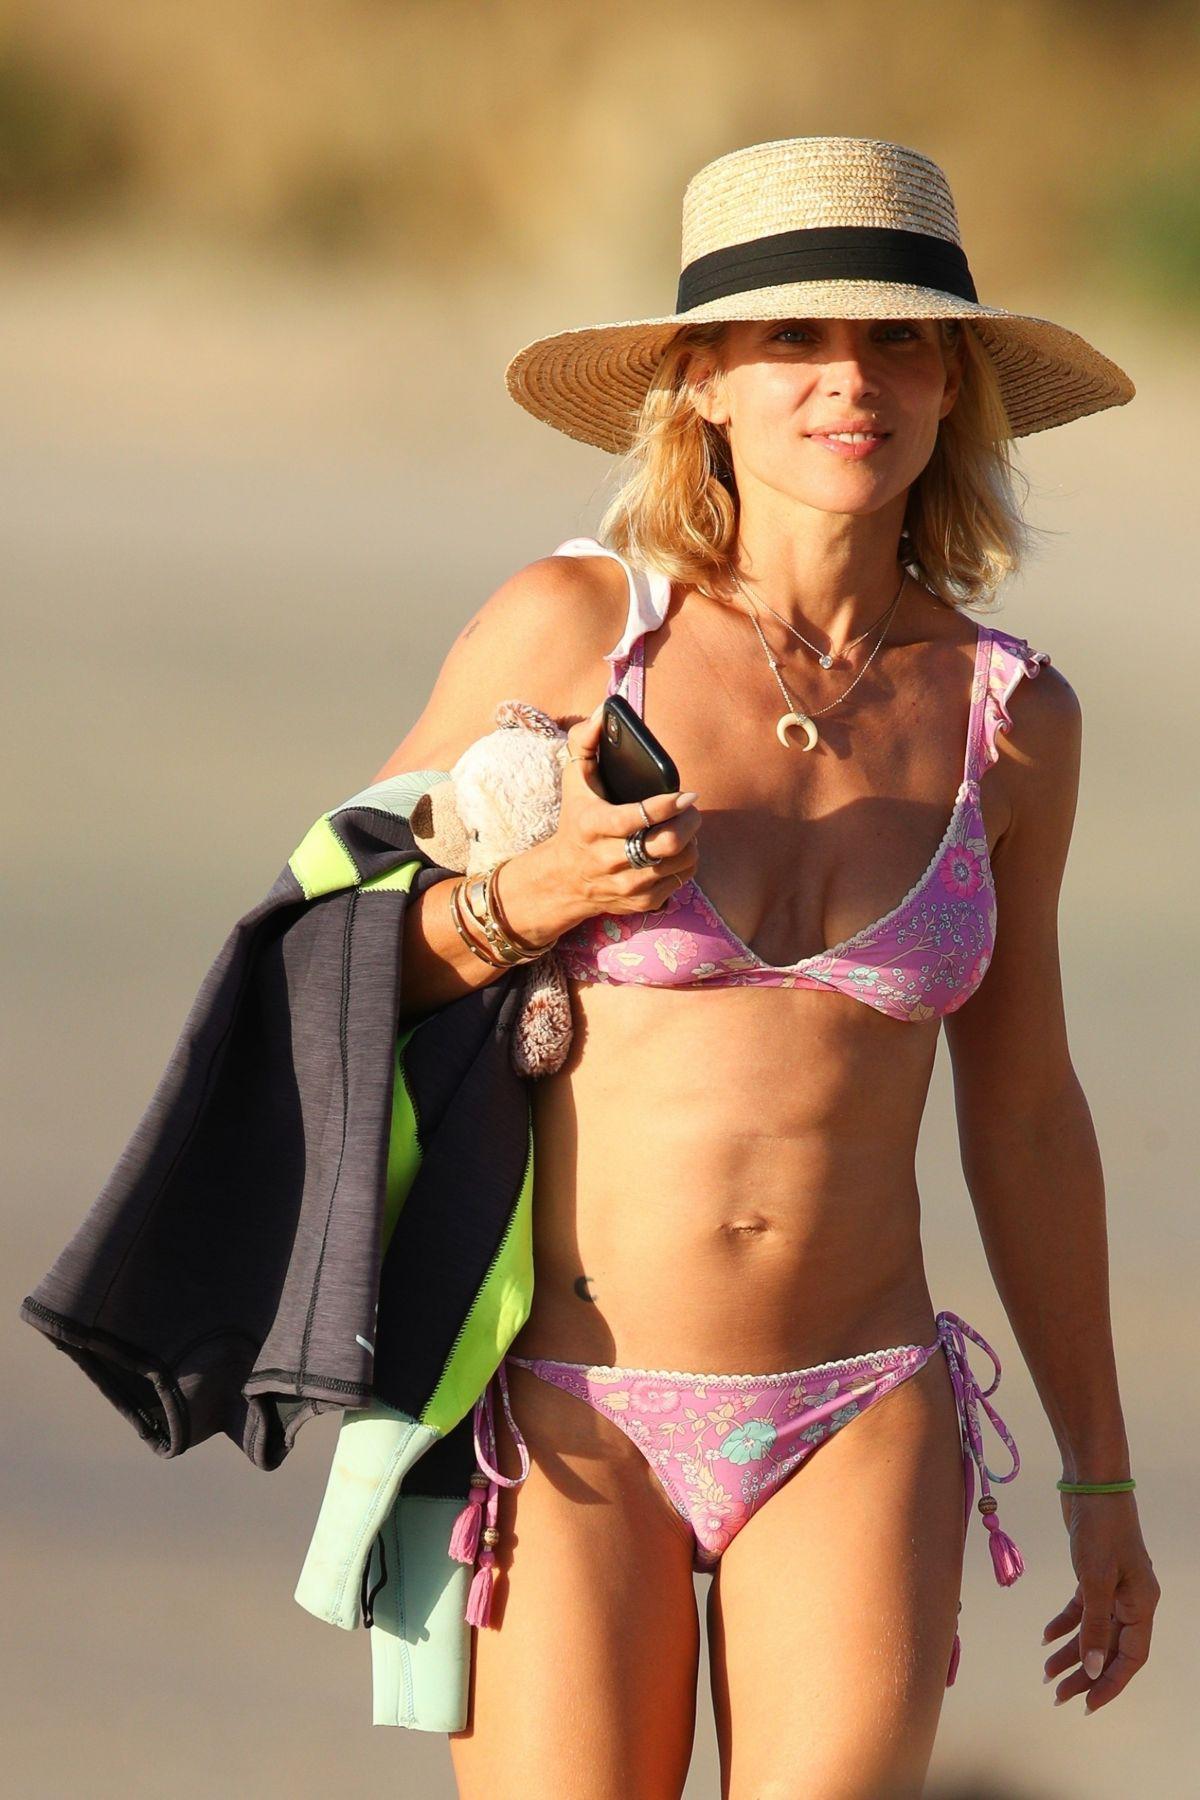 Bikini Elsa Pataky nudes (35 images), Paparazzi